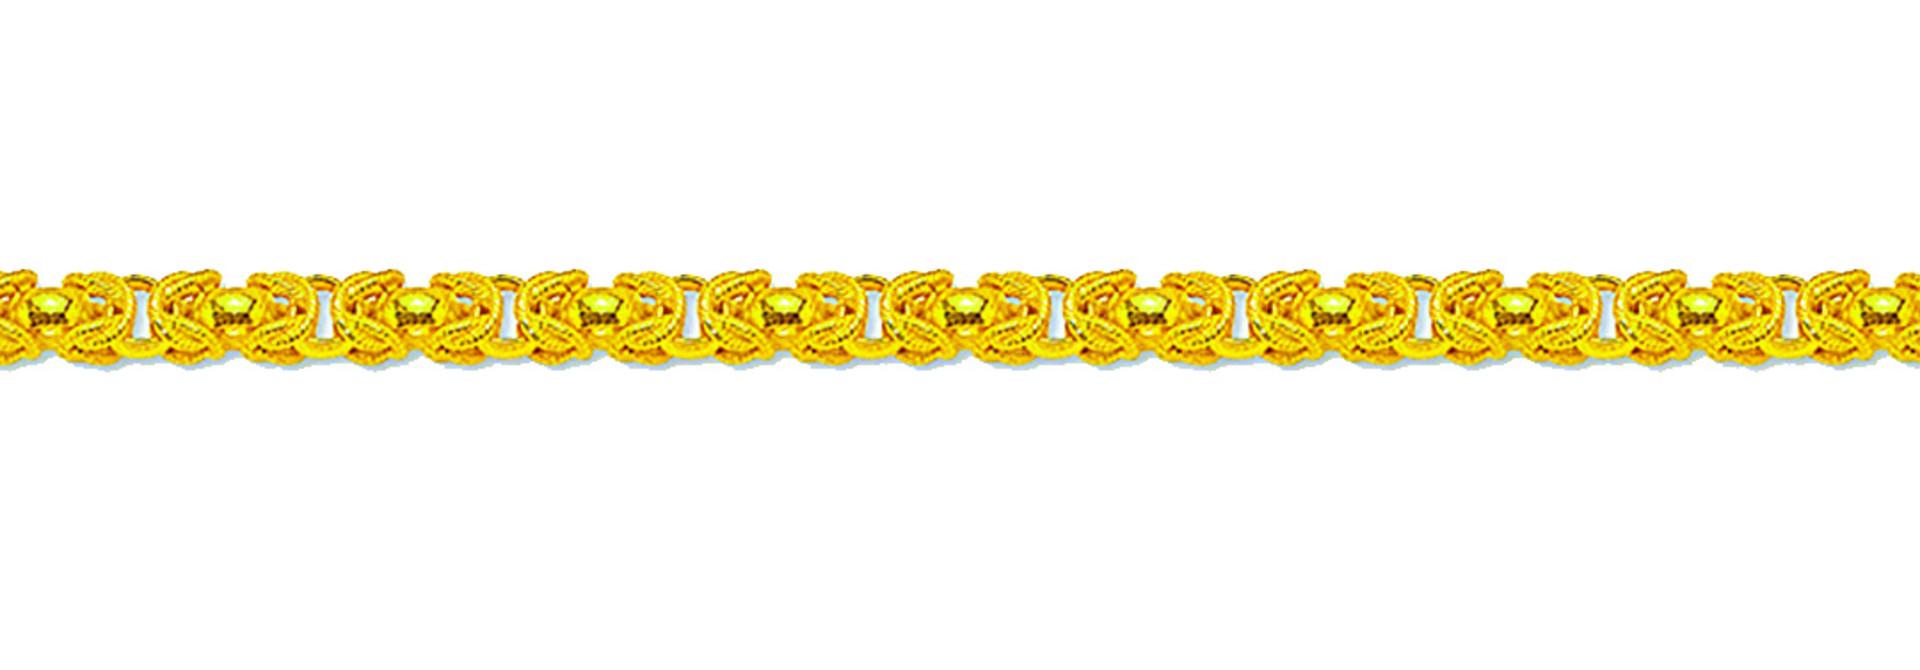 Koningschakel armband/ketting